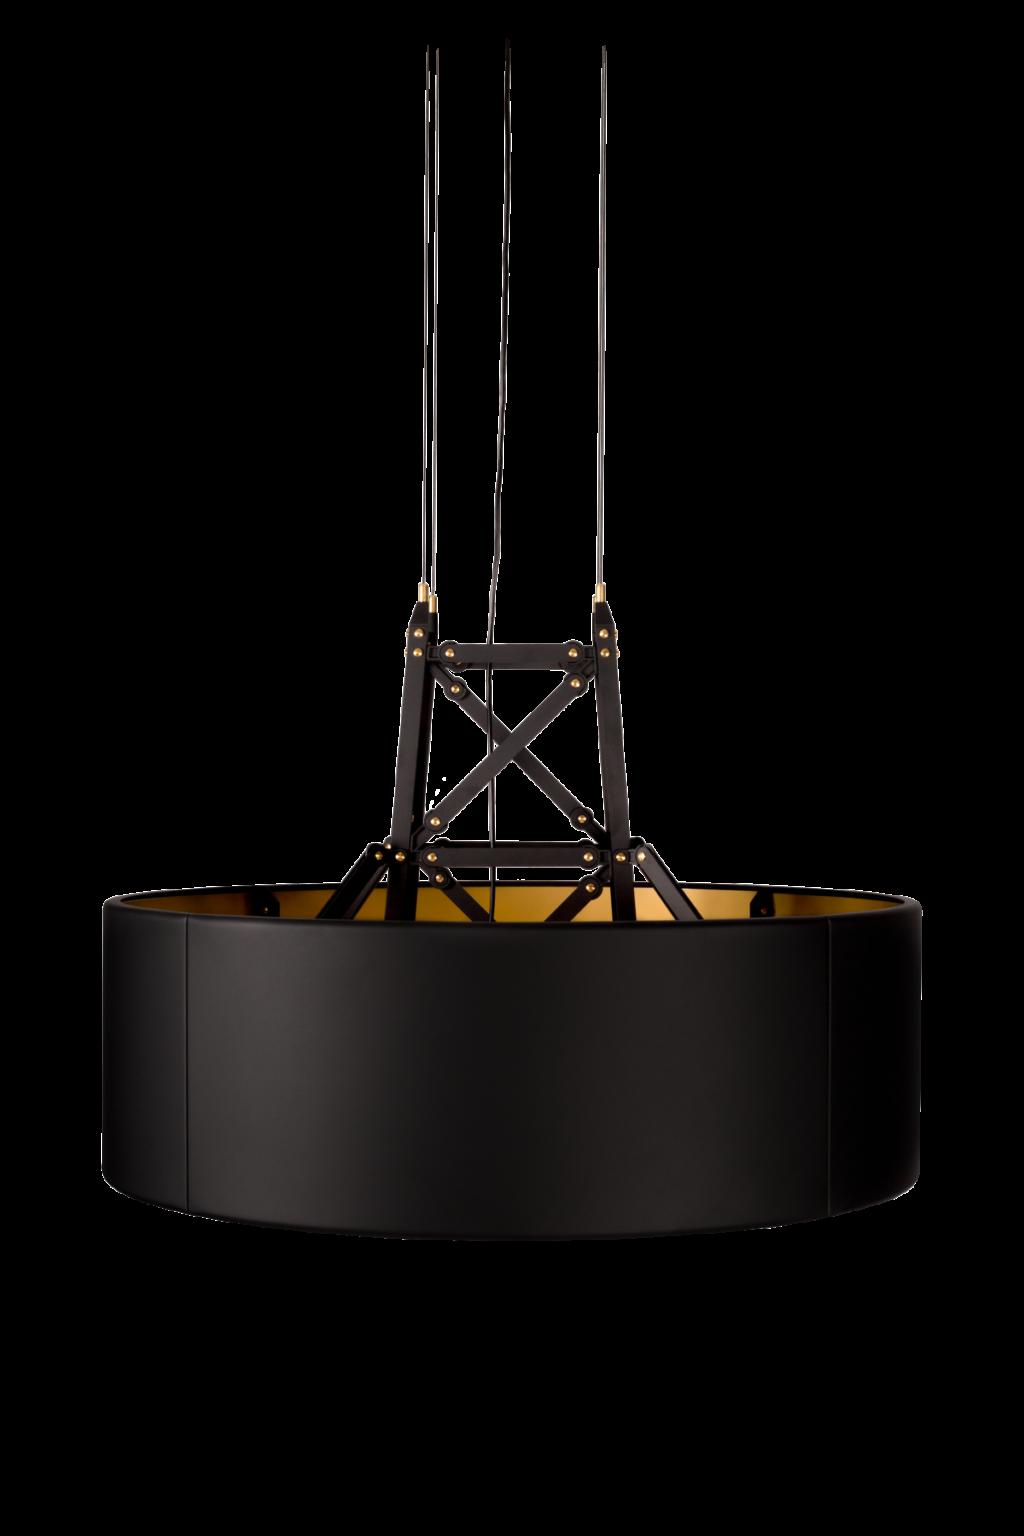 https://desidea.hu/wp-content/uploads/fly-images/160146/moooi-construction-lamp-fuggesztett-lampa1-1024x0.png